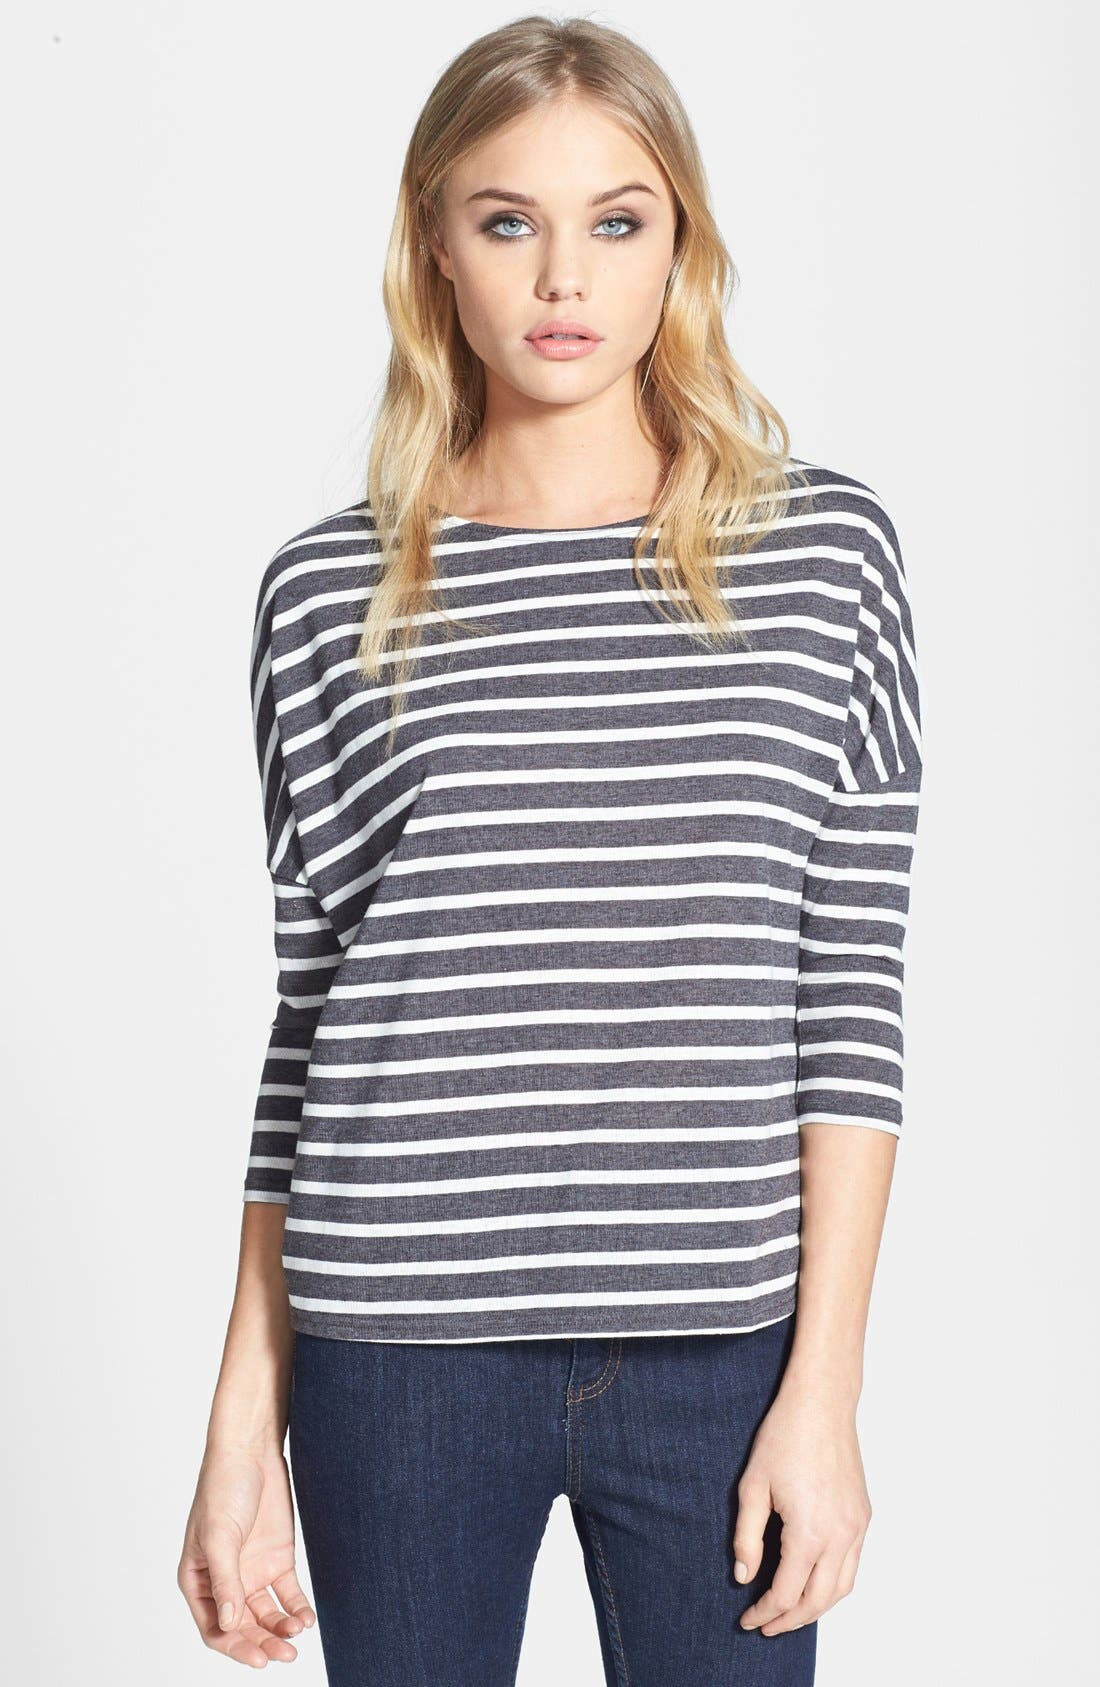 Alternate Image 1 Selected - Topshop Stripe Linen Tee